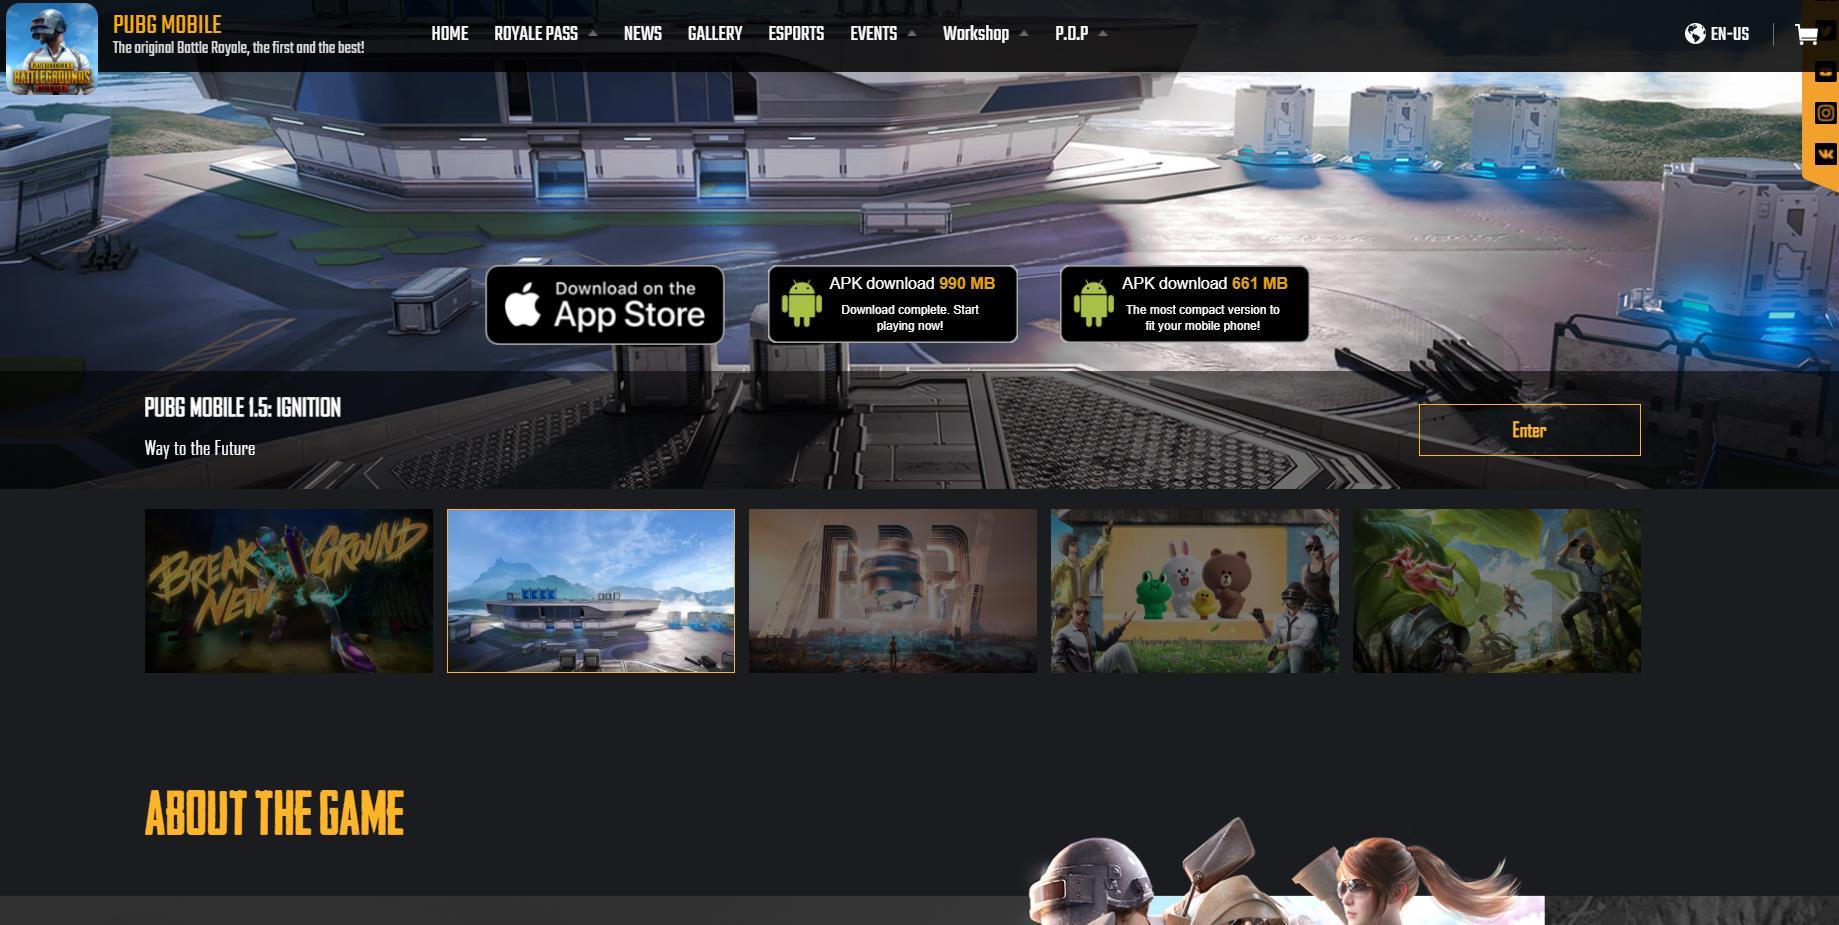 PUBG MOBILE官网 《绝地求生》手机版游戏